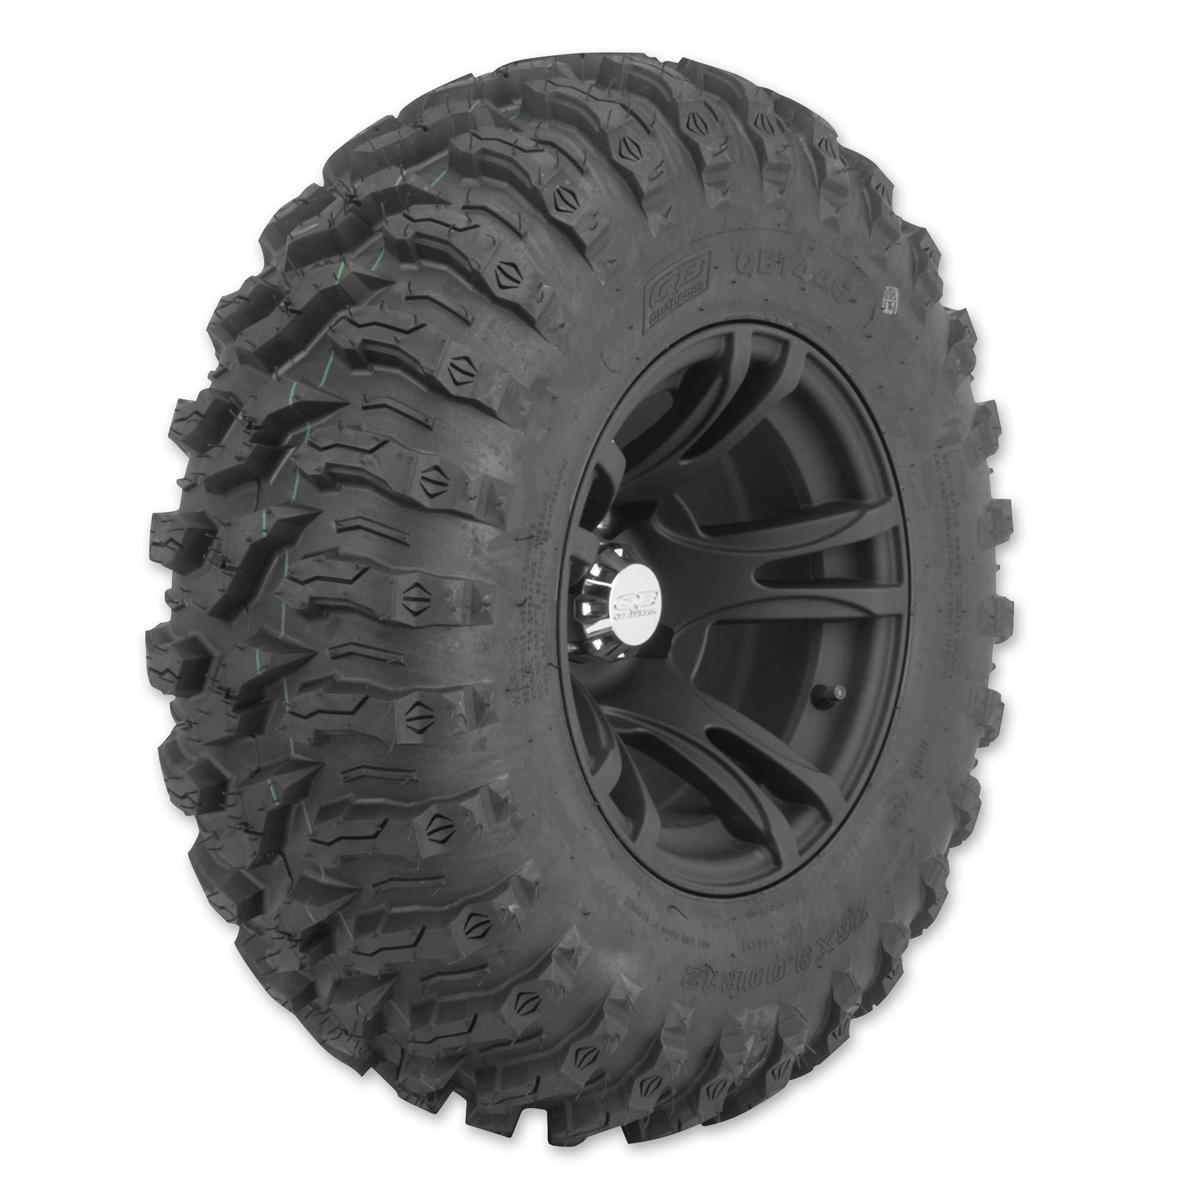 Quadboss QBT446 26X9R12 8-Ply Front Tire